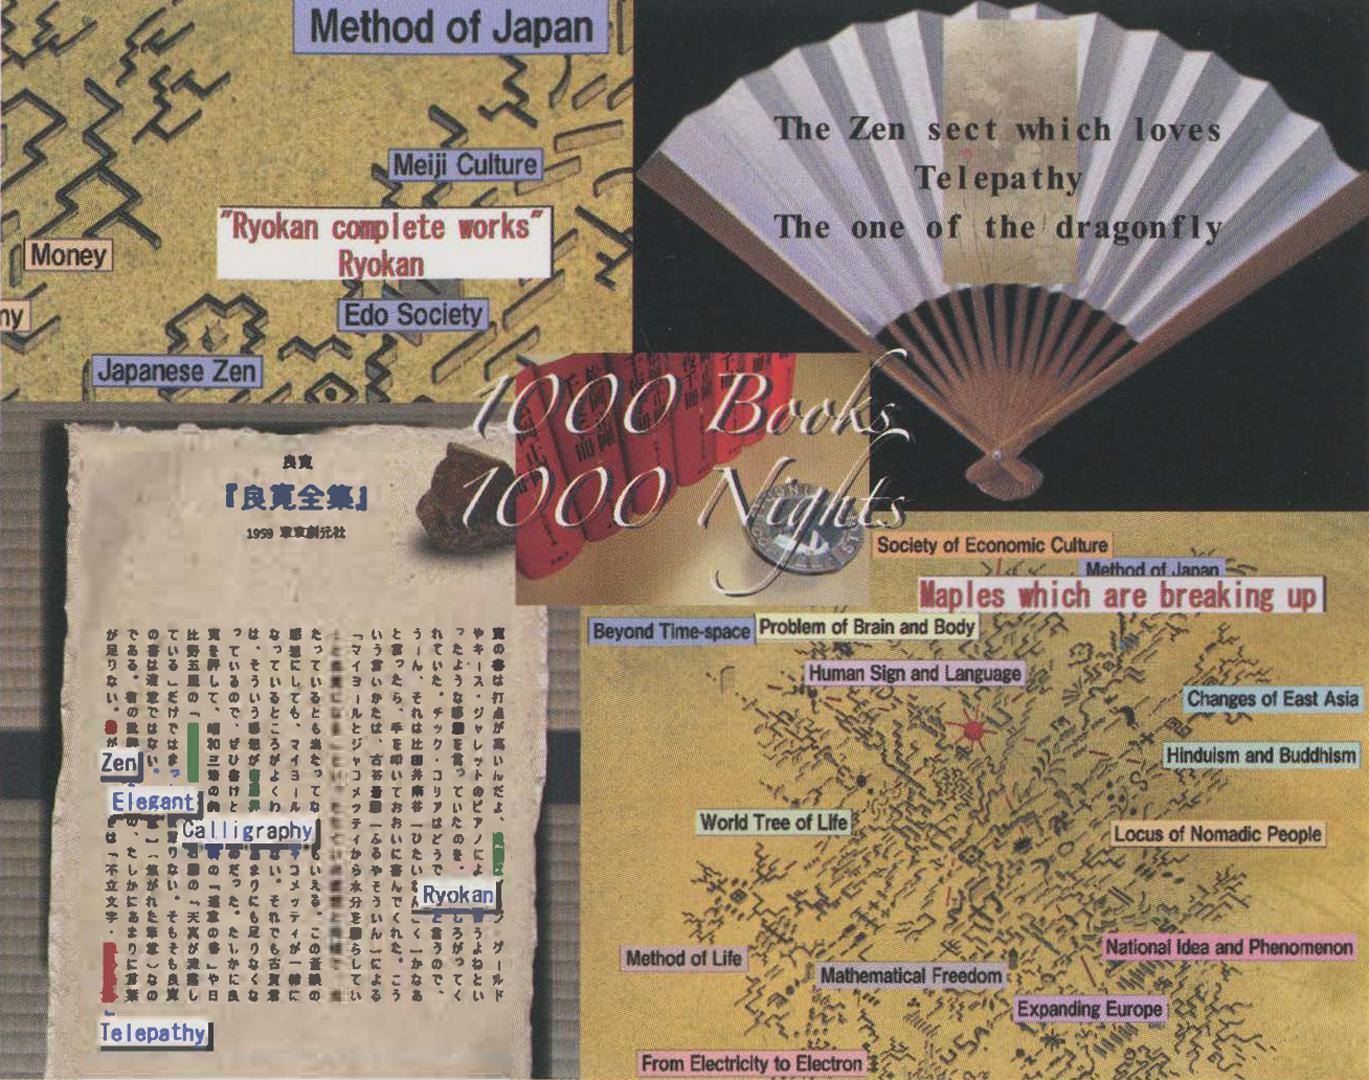 ©2007, Seigow Matsuoka Editorial Engineering Laboratory and Naoko Tosa, Hitch-Haiku